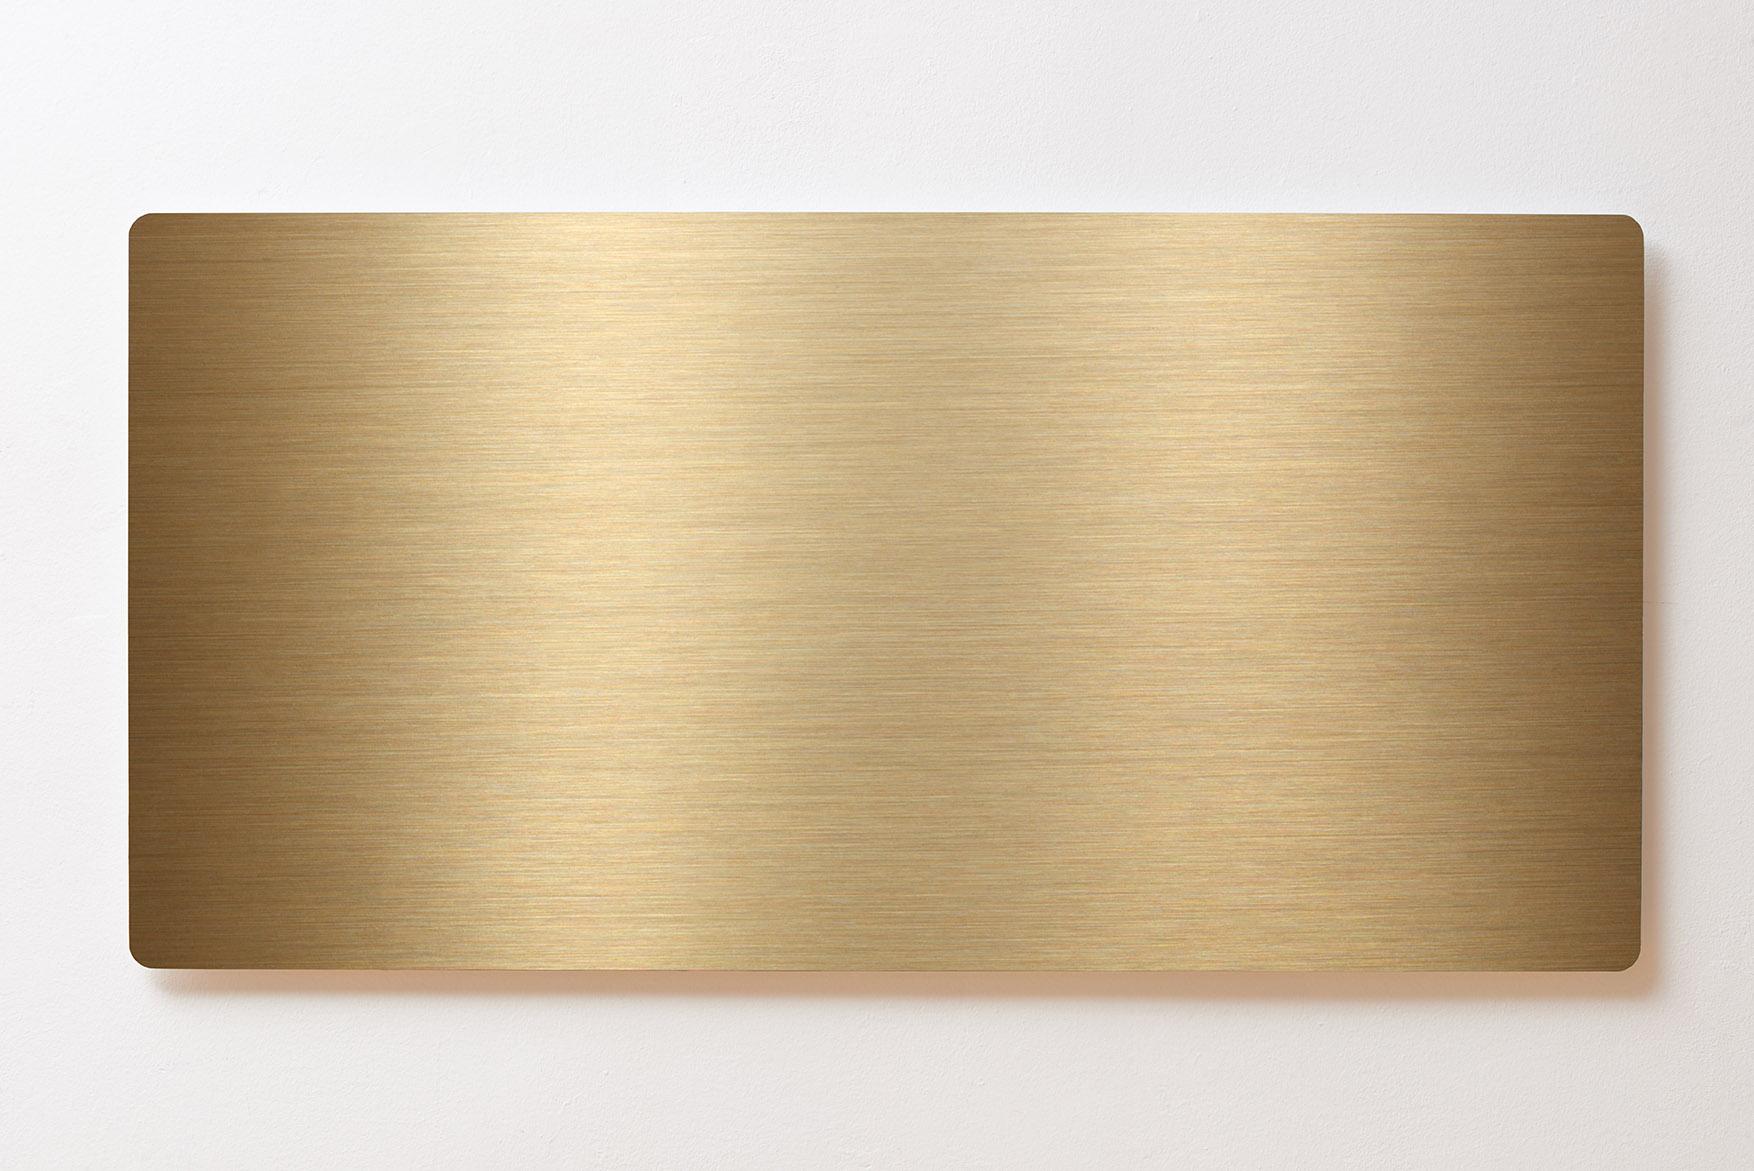 Magnettafel BACKLIGHT 120x60cm Motiv-Wandbild M114 Metall Struktur